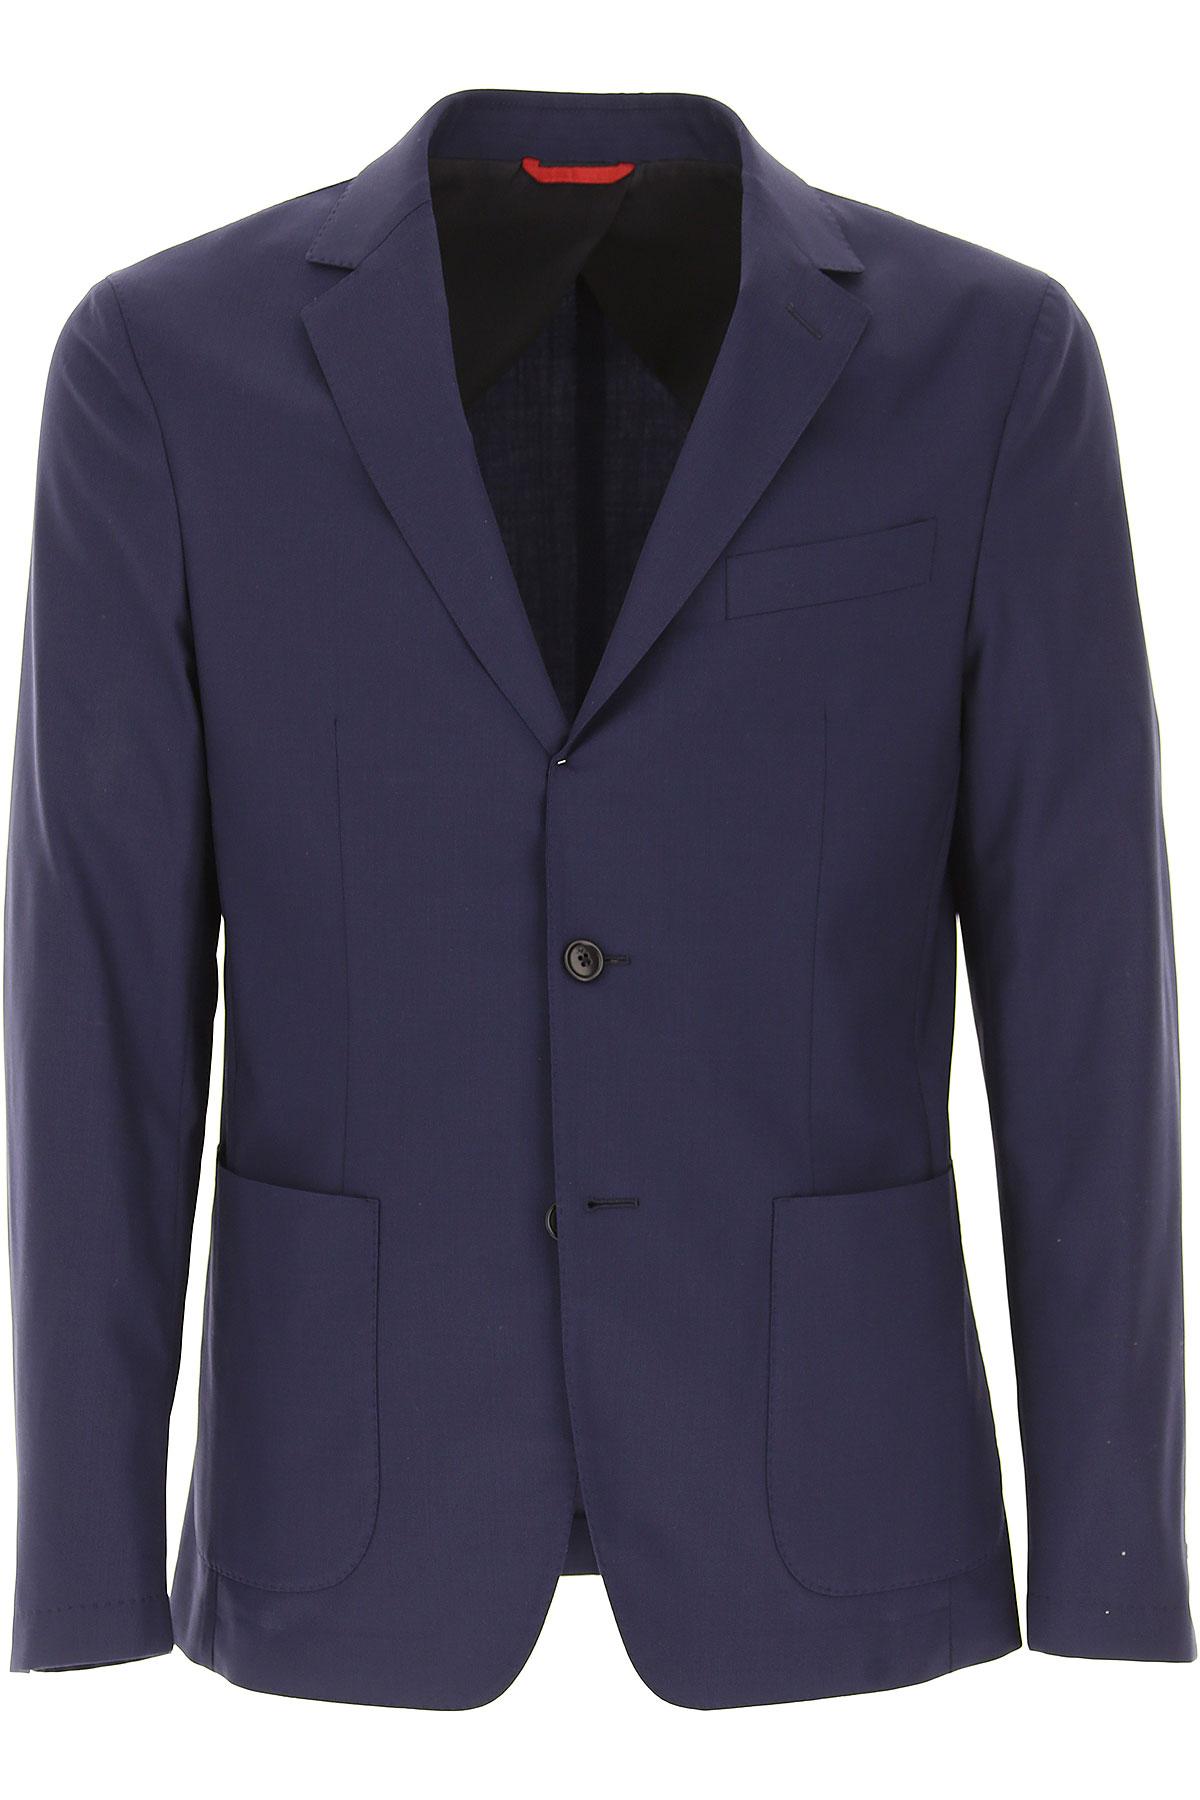 Image of Fay Blazer for Men, Sport Coat On Sale, Dark Blue, Wool, 2017, L M S XXL